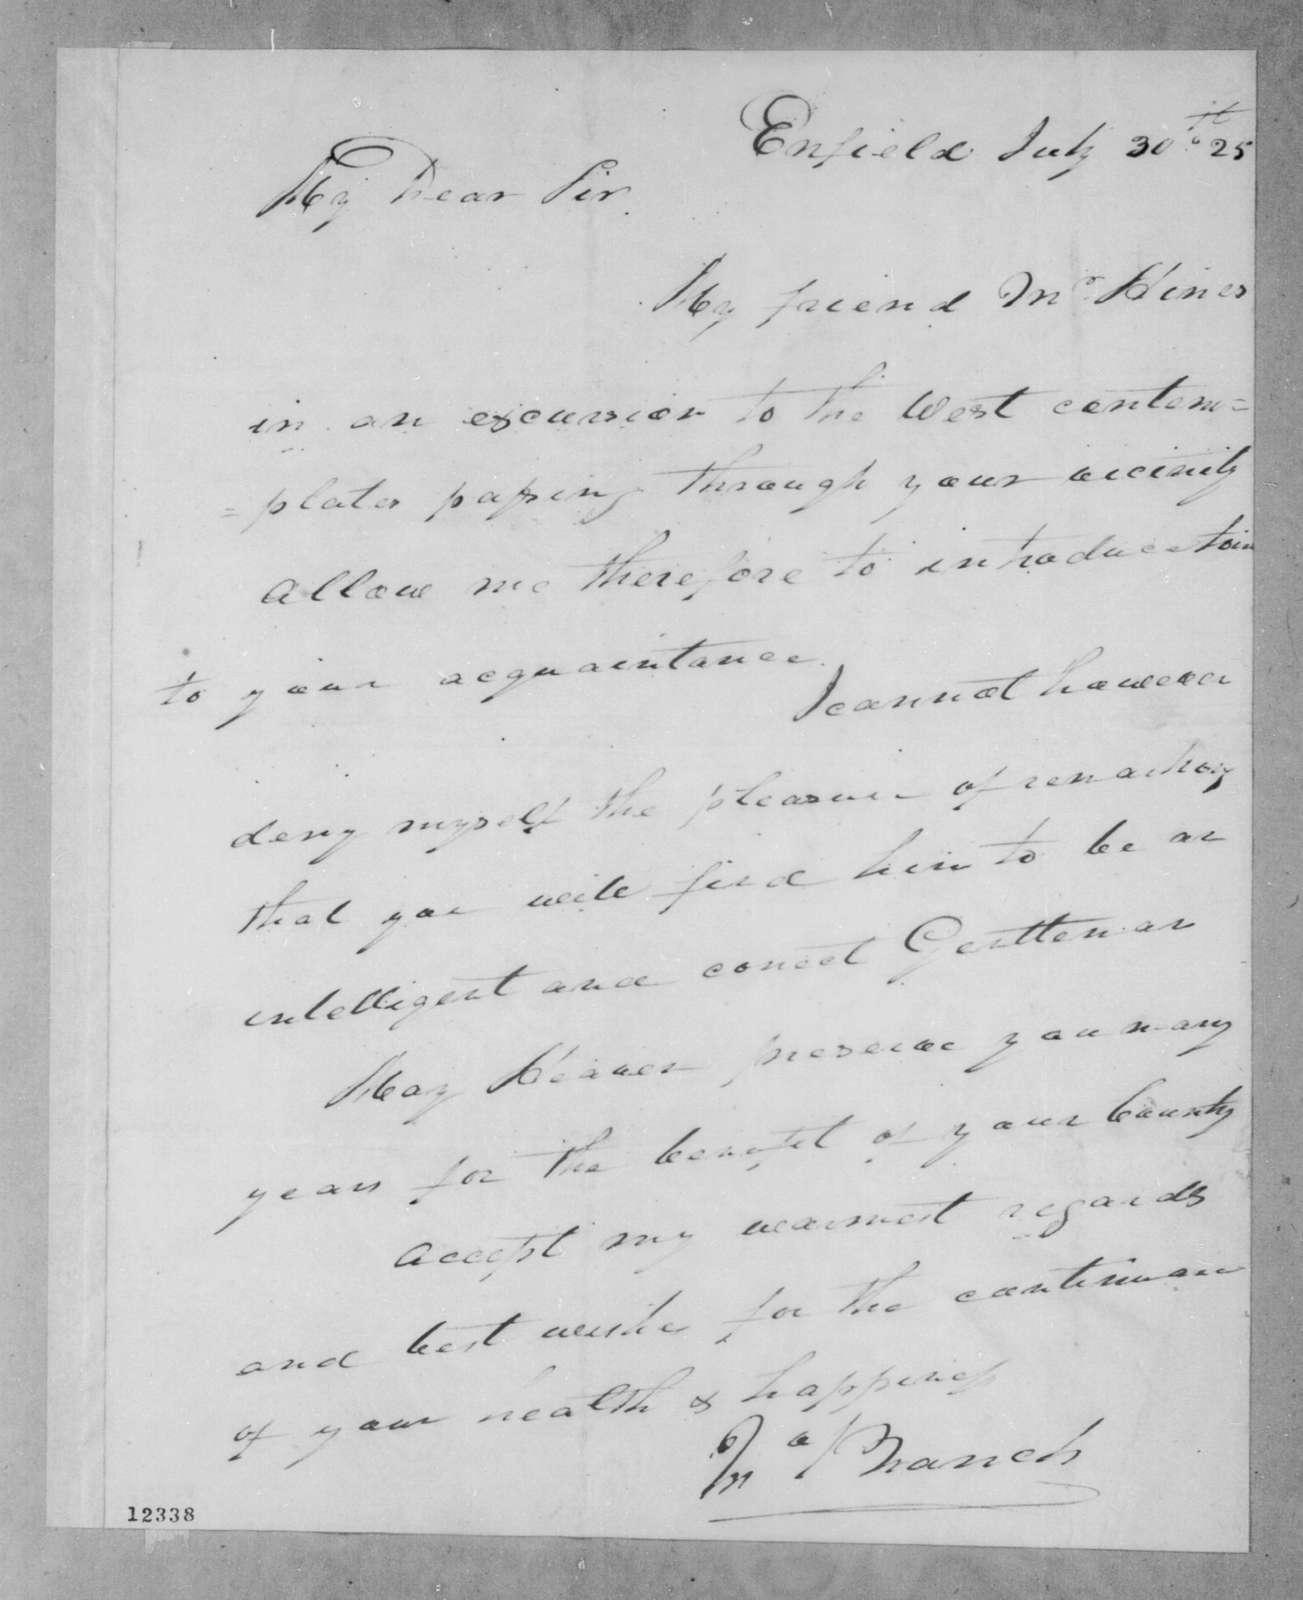 John Branch to Andrew Jackson, July 30, 1825